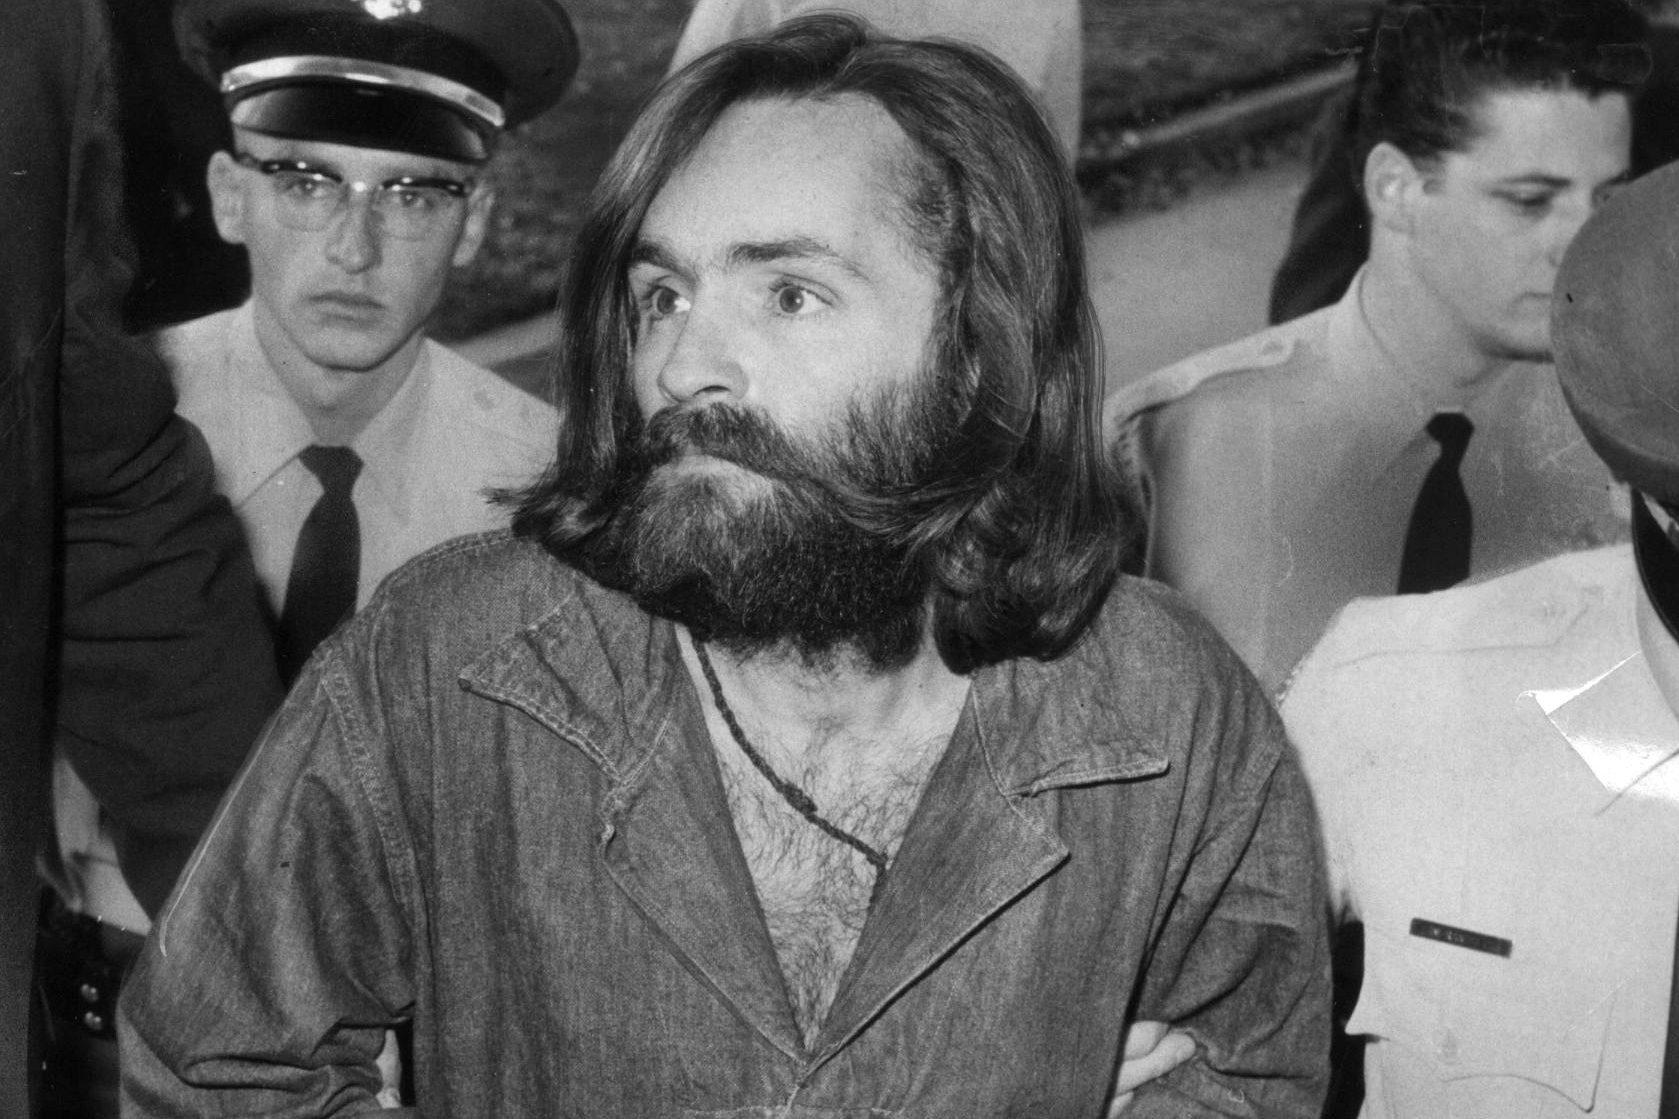 Charles Manson claims innocence